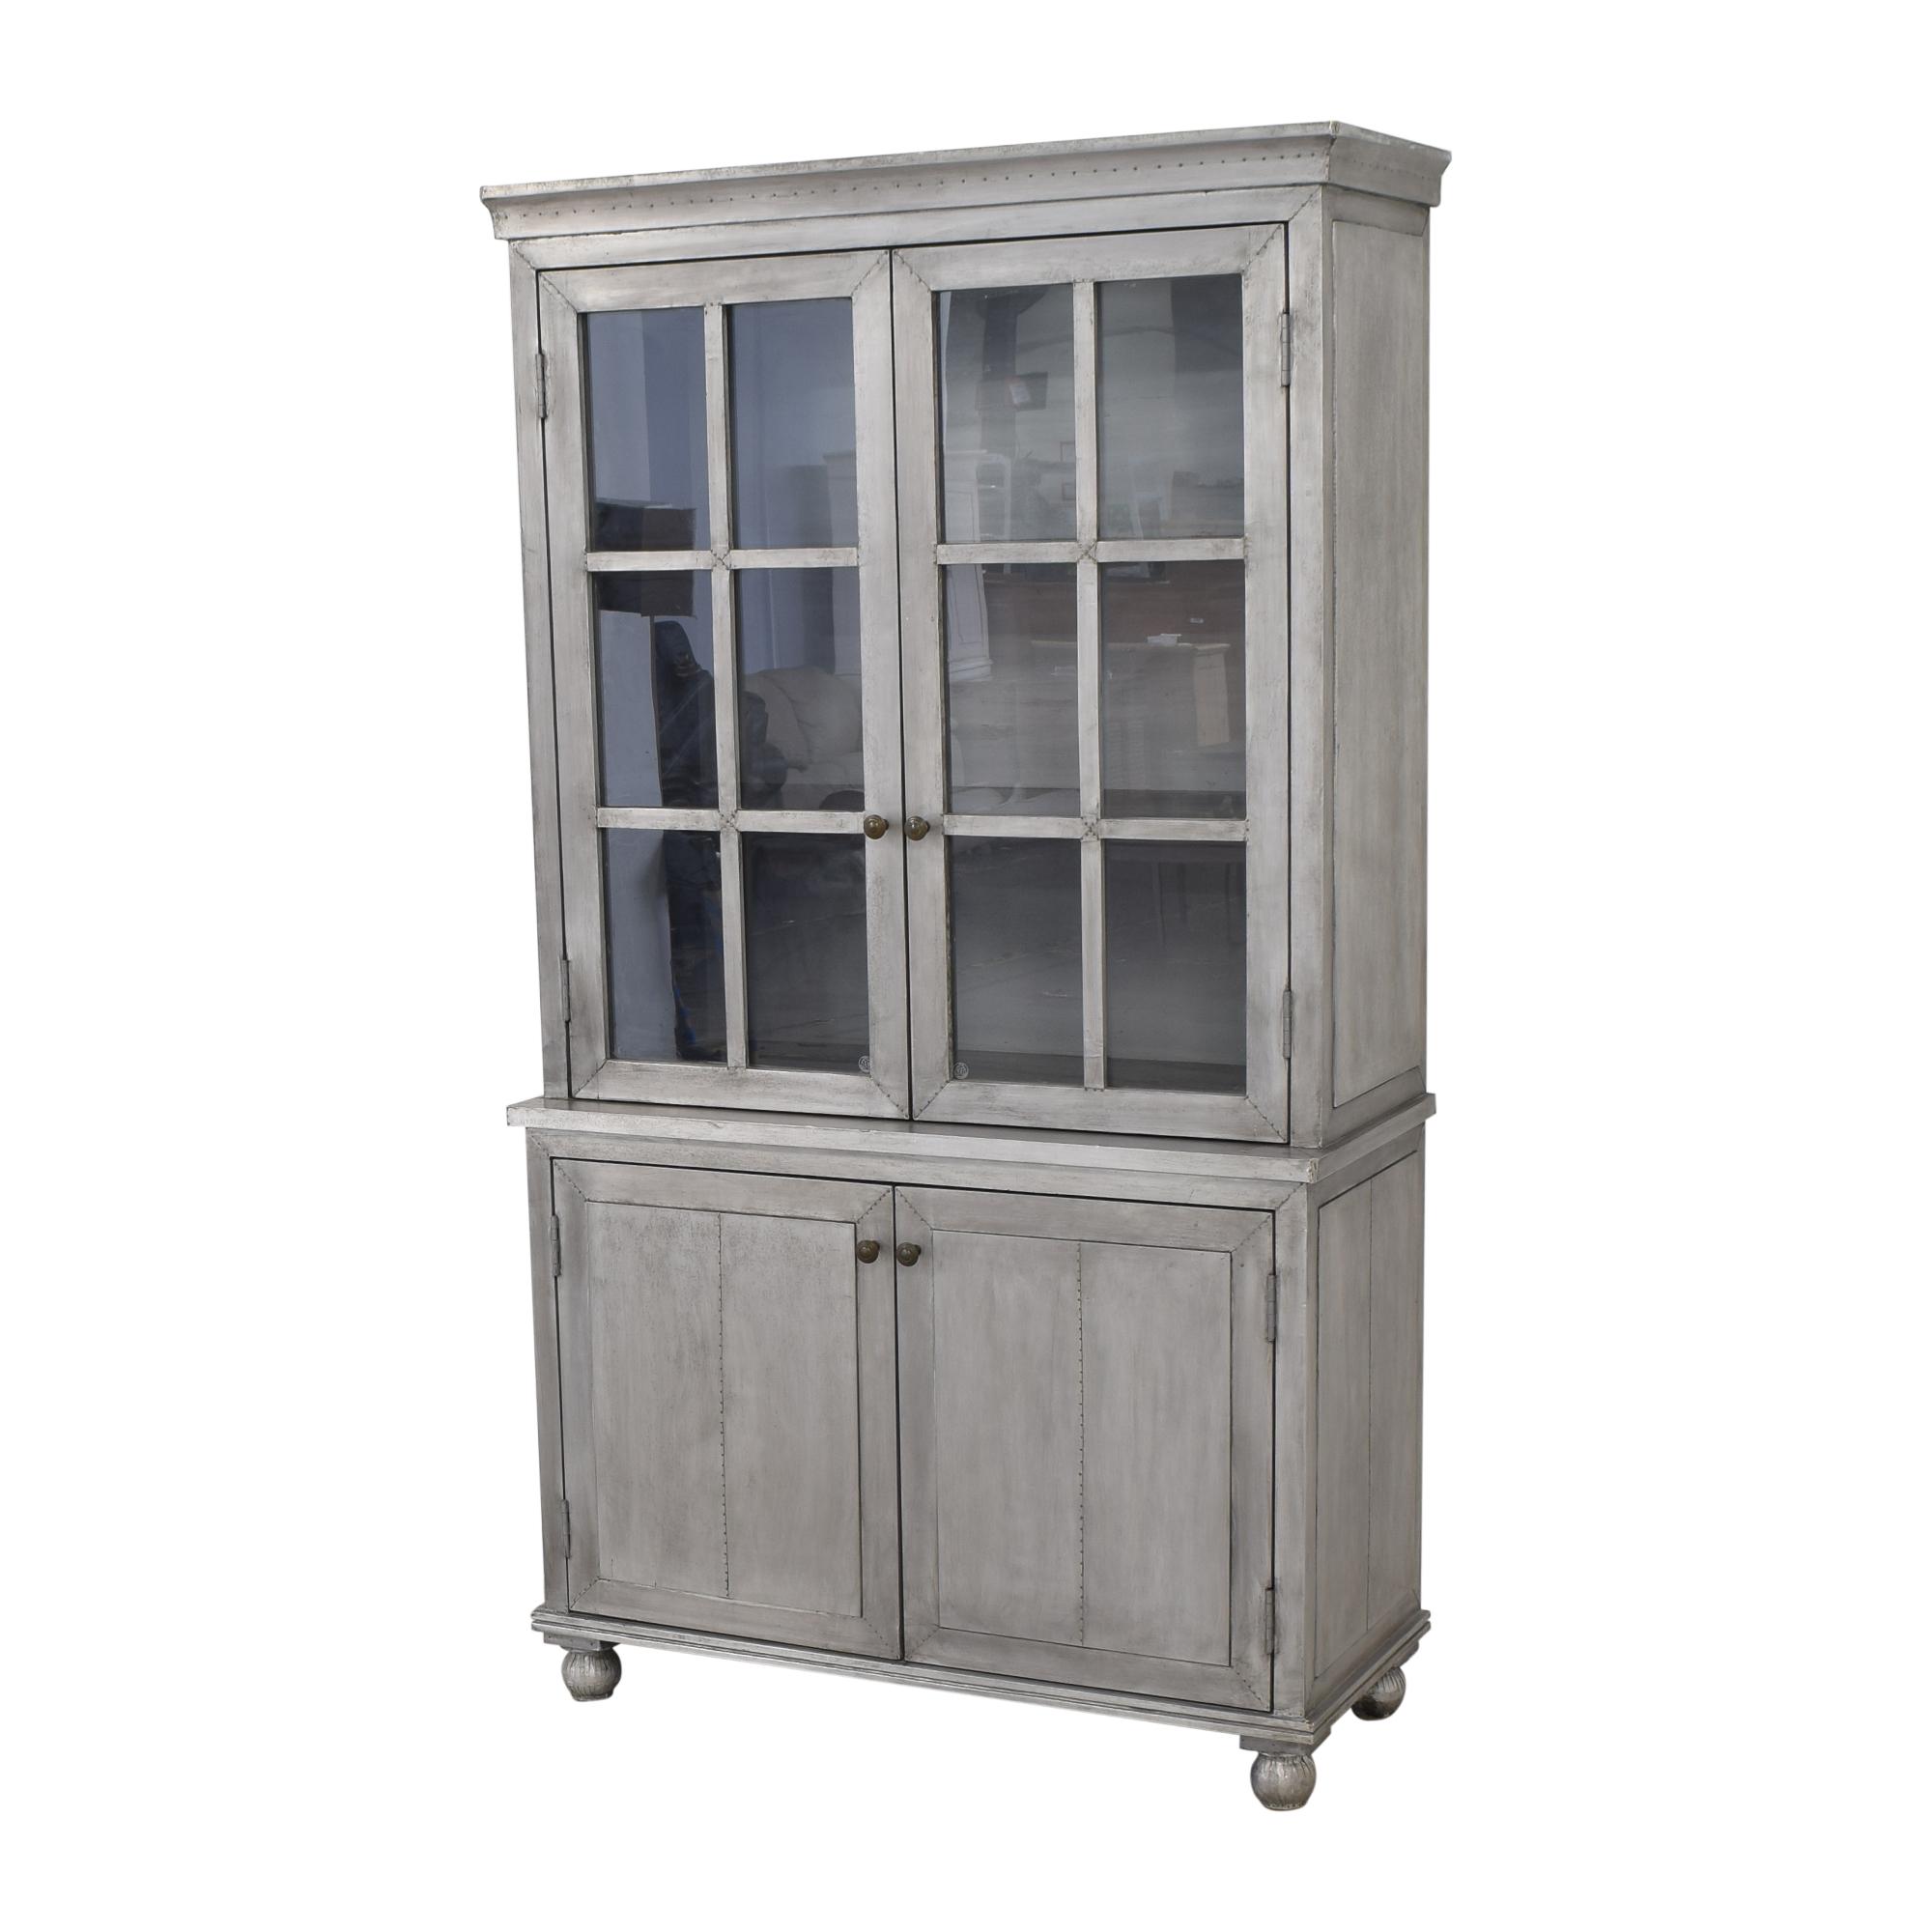 Restoration Hardware Restoration Hardware Annecy Double-Door Sideboard & Hutch Cabinets & Sideboards